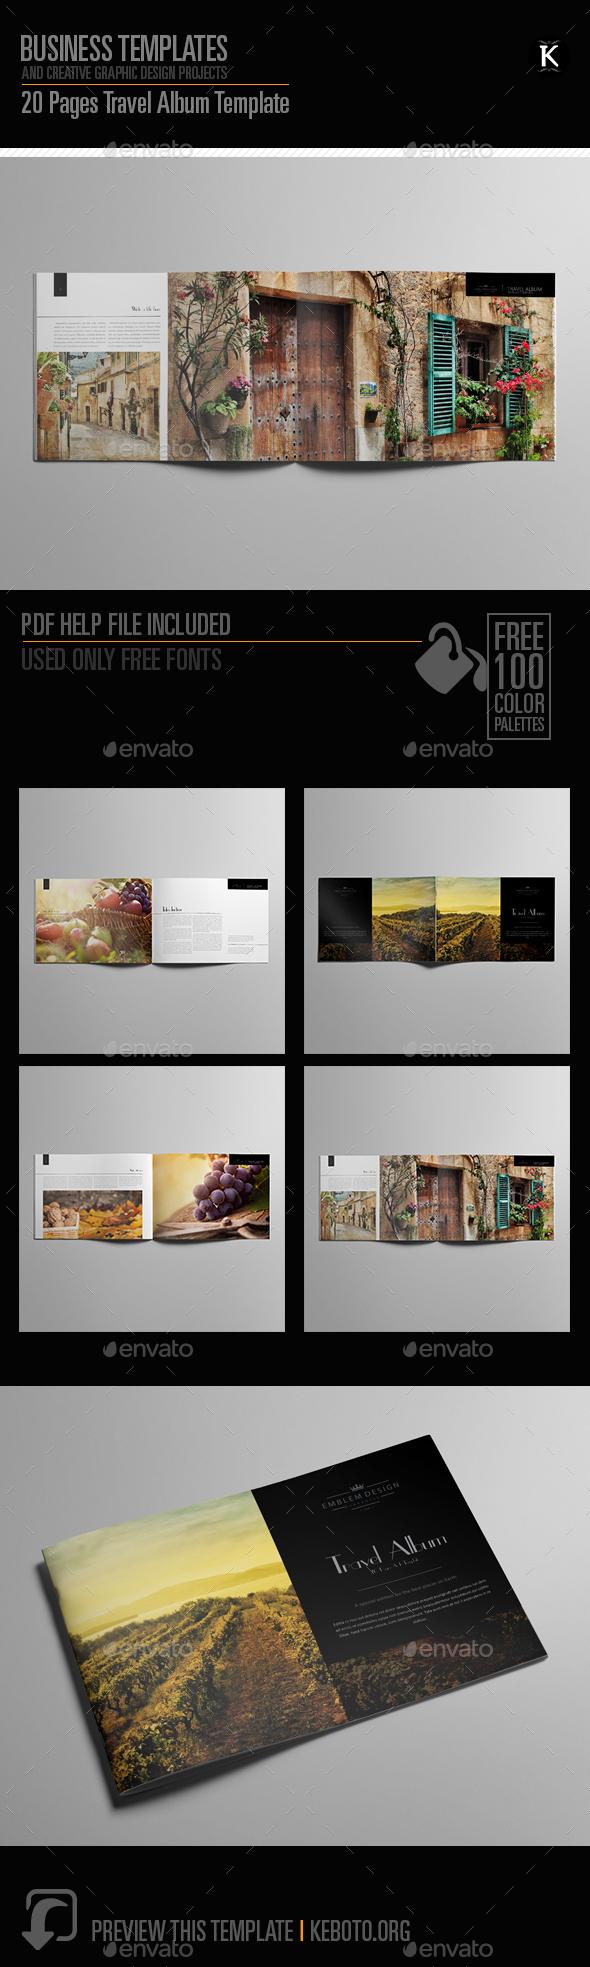 20 Pages Travel Album Template - Photo Albums Print Templates